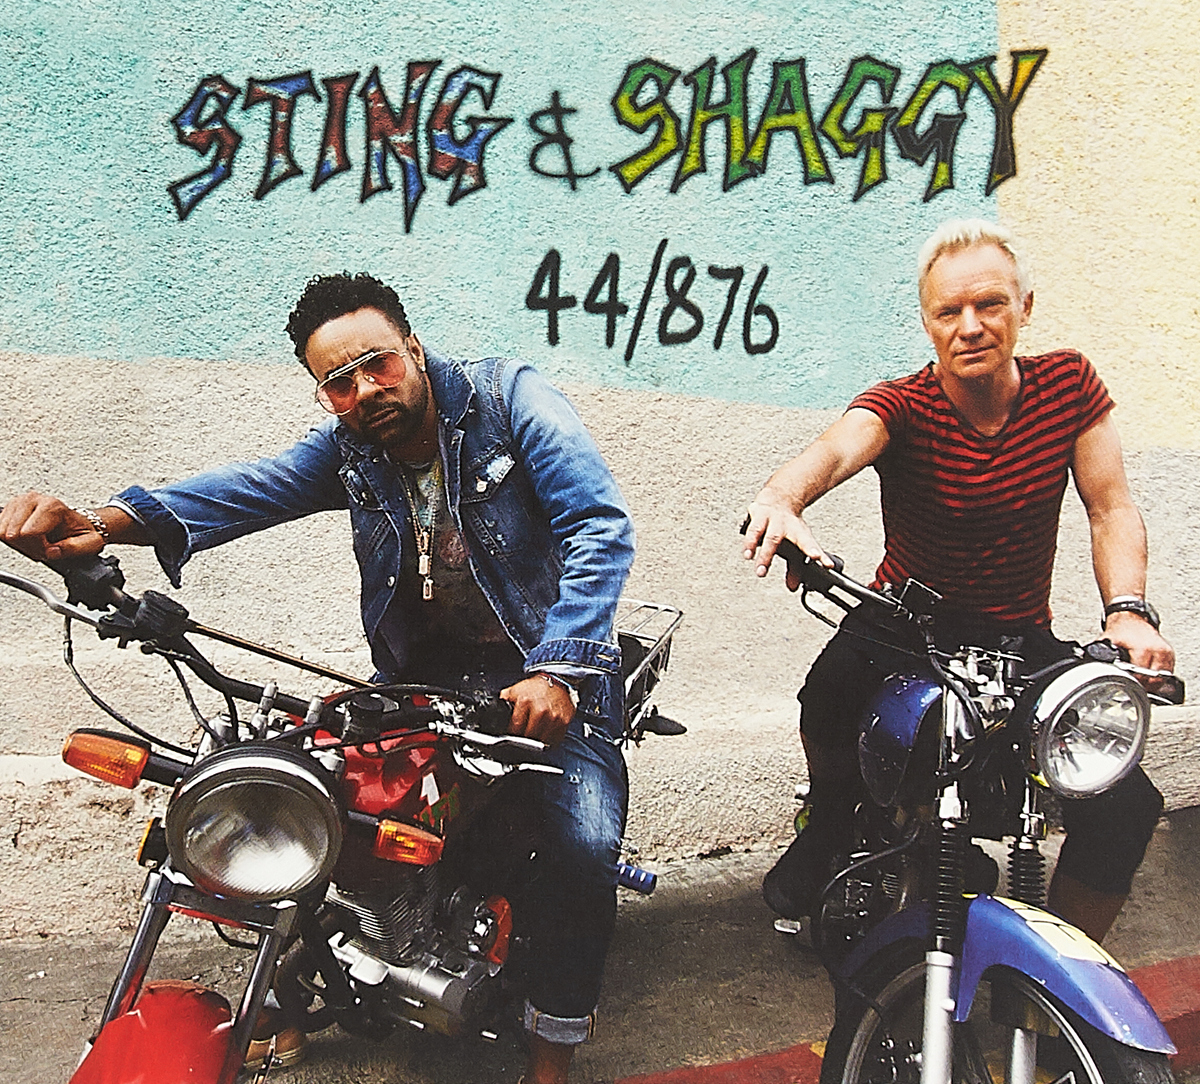 Стинг Sting & Shaggy. 44/876 стинг sting the soul cages